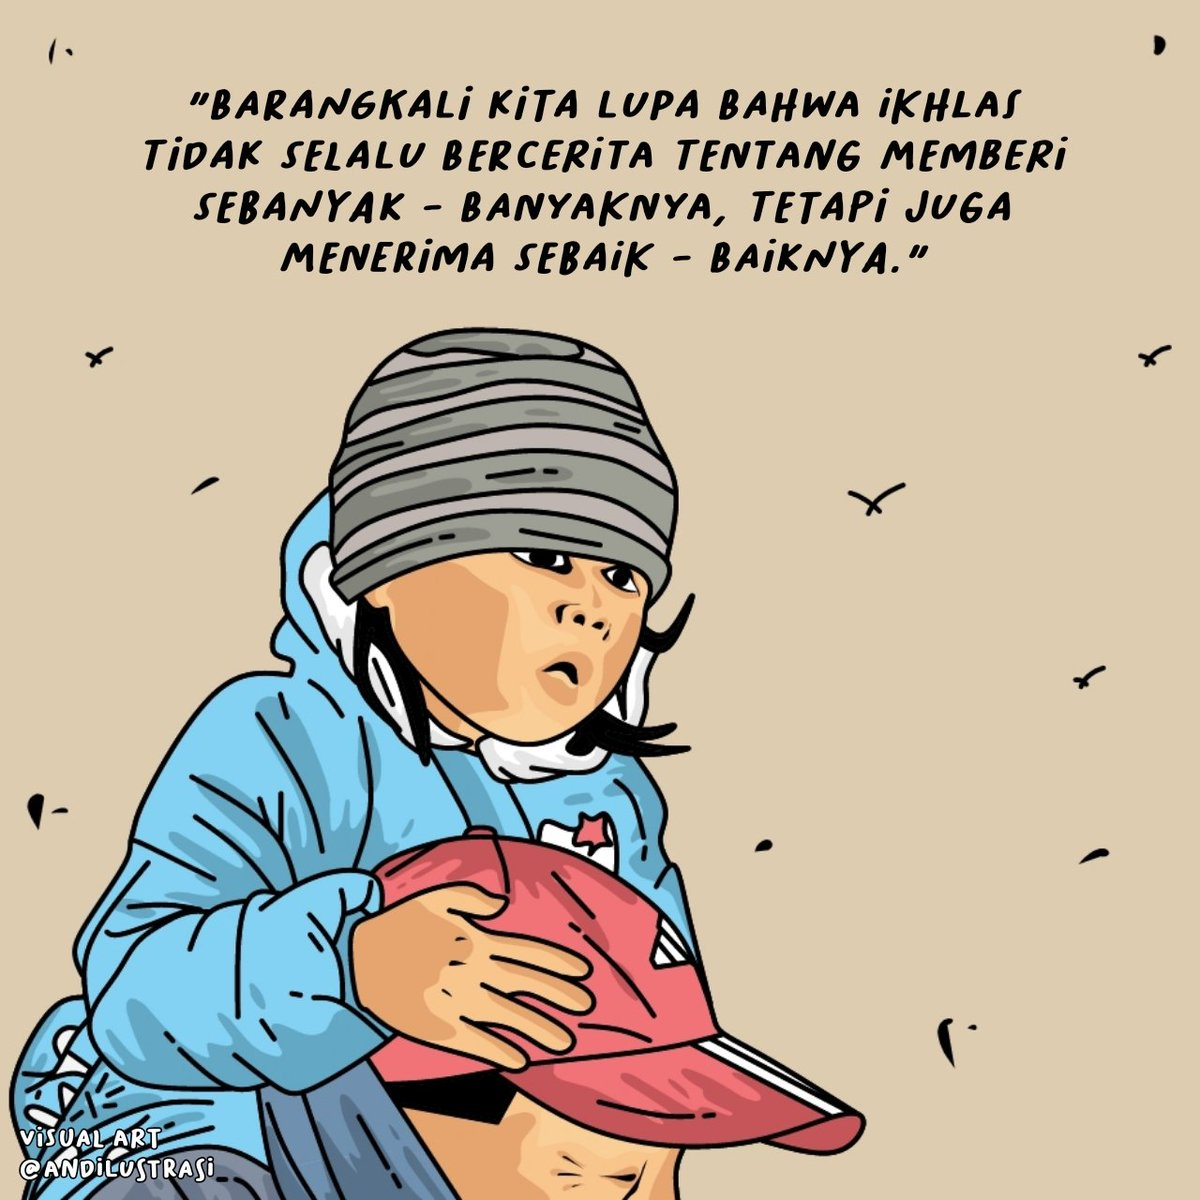 Ikhlas . . . #andilustrasi #illustration #seniman #art #masakecil #generasi90an #gambarkartun #karyavisual #kartunmuslimah #masakecilbahagia #selalubersyukur #vectorart #ilustrasikartun #ilustrasi #kartundakwah #quoteindonesia #quoteindo #senimankata #senimanindonesia #caknun